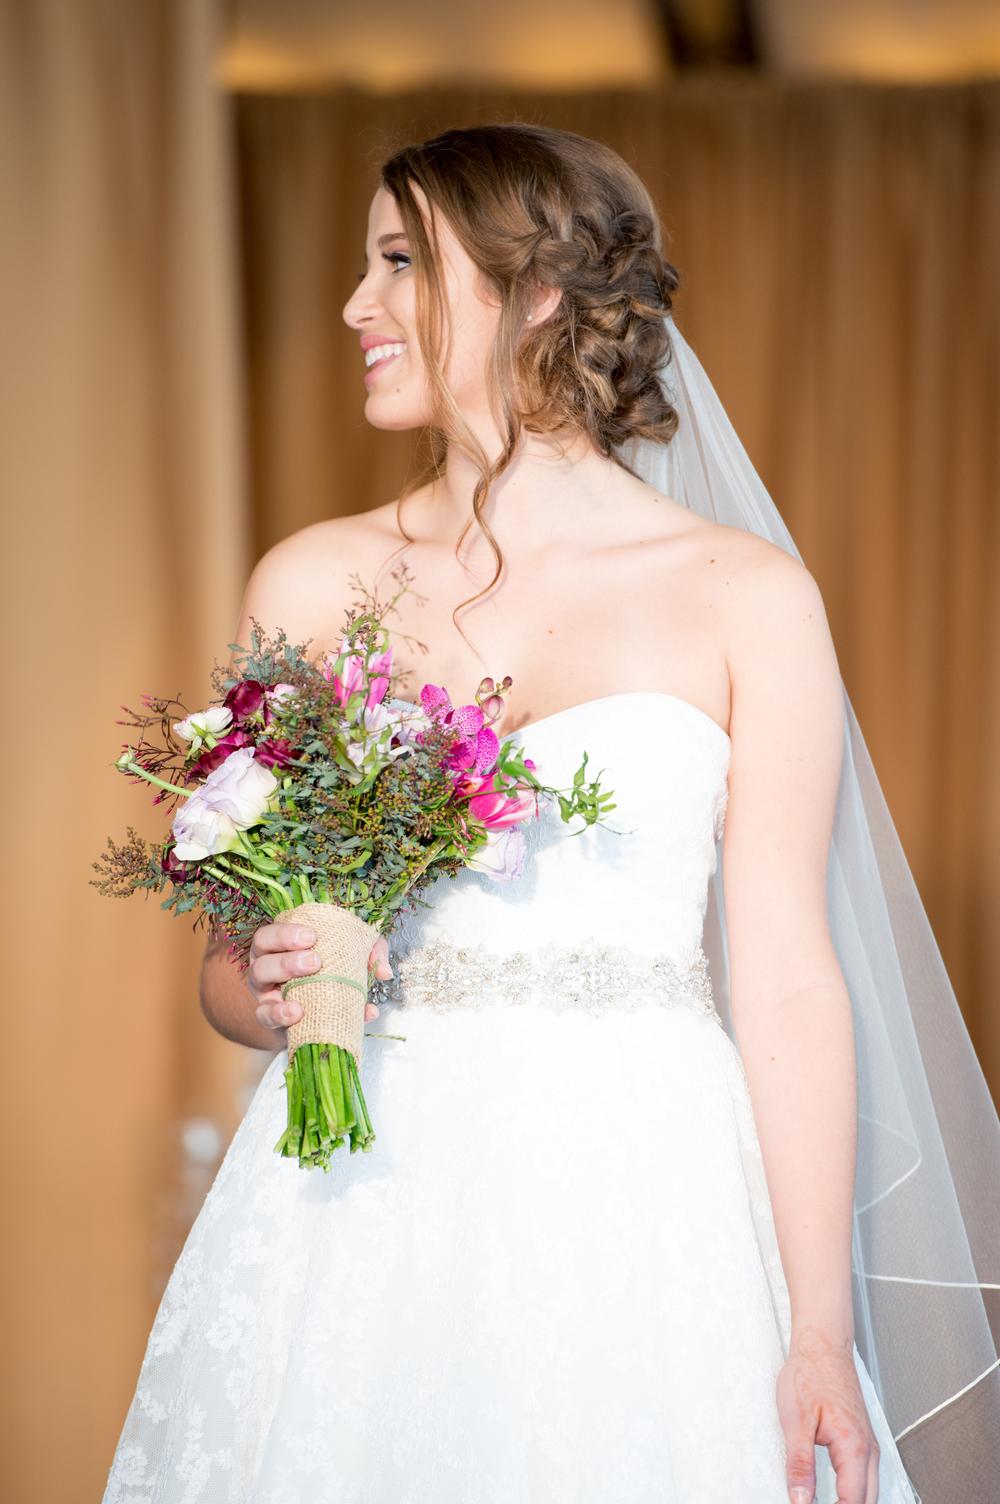 Model: Nicole Rizzuti //  Hair: Jennifer Singleton | Umbrella Salon //  Make-Up: Jennifer Imbat //   Photography:  Khiem Hoang